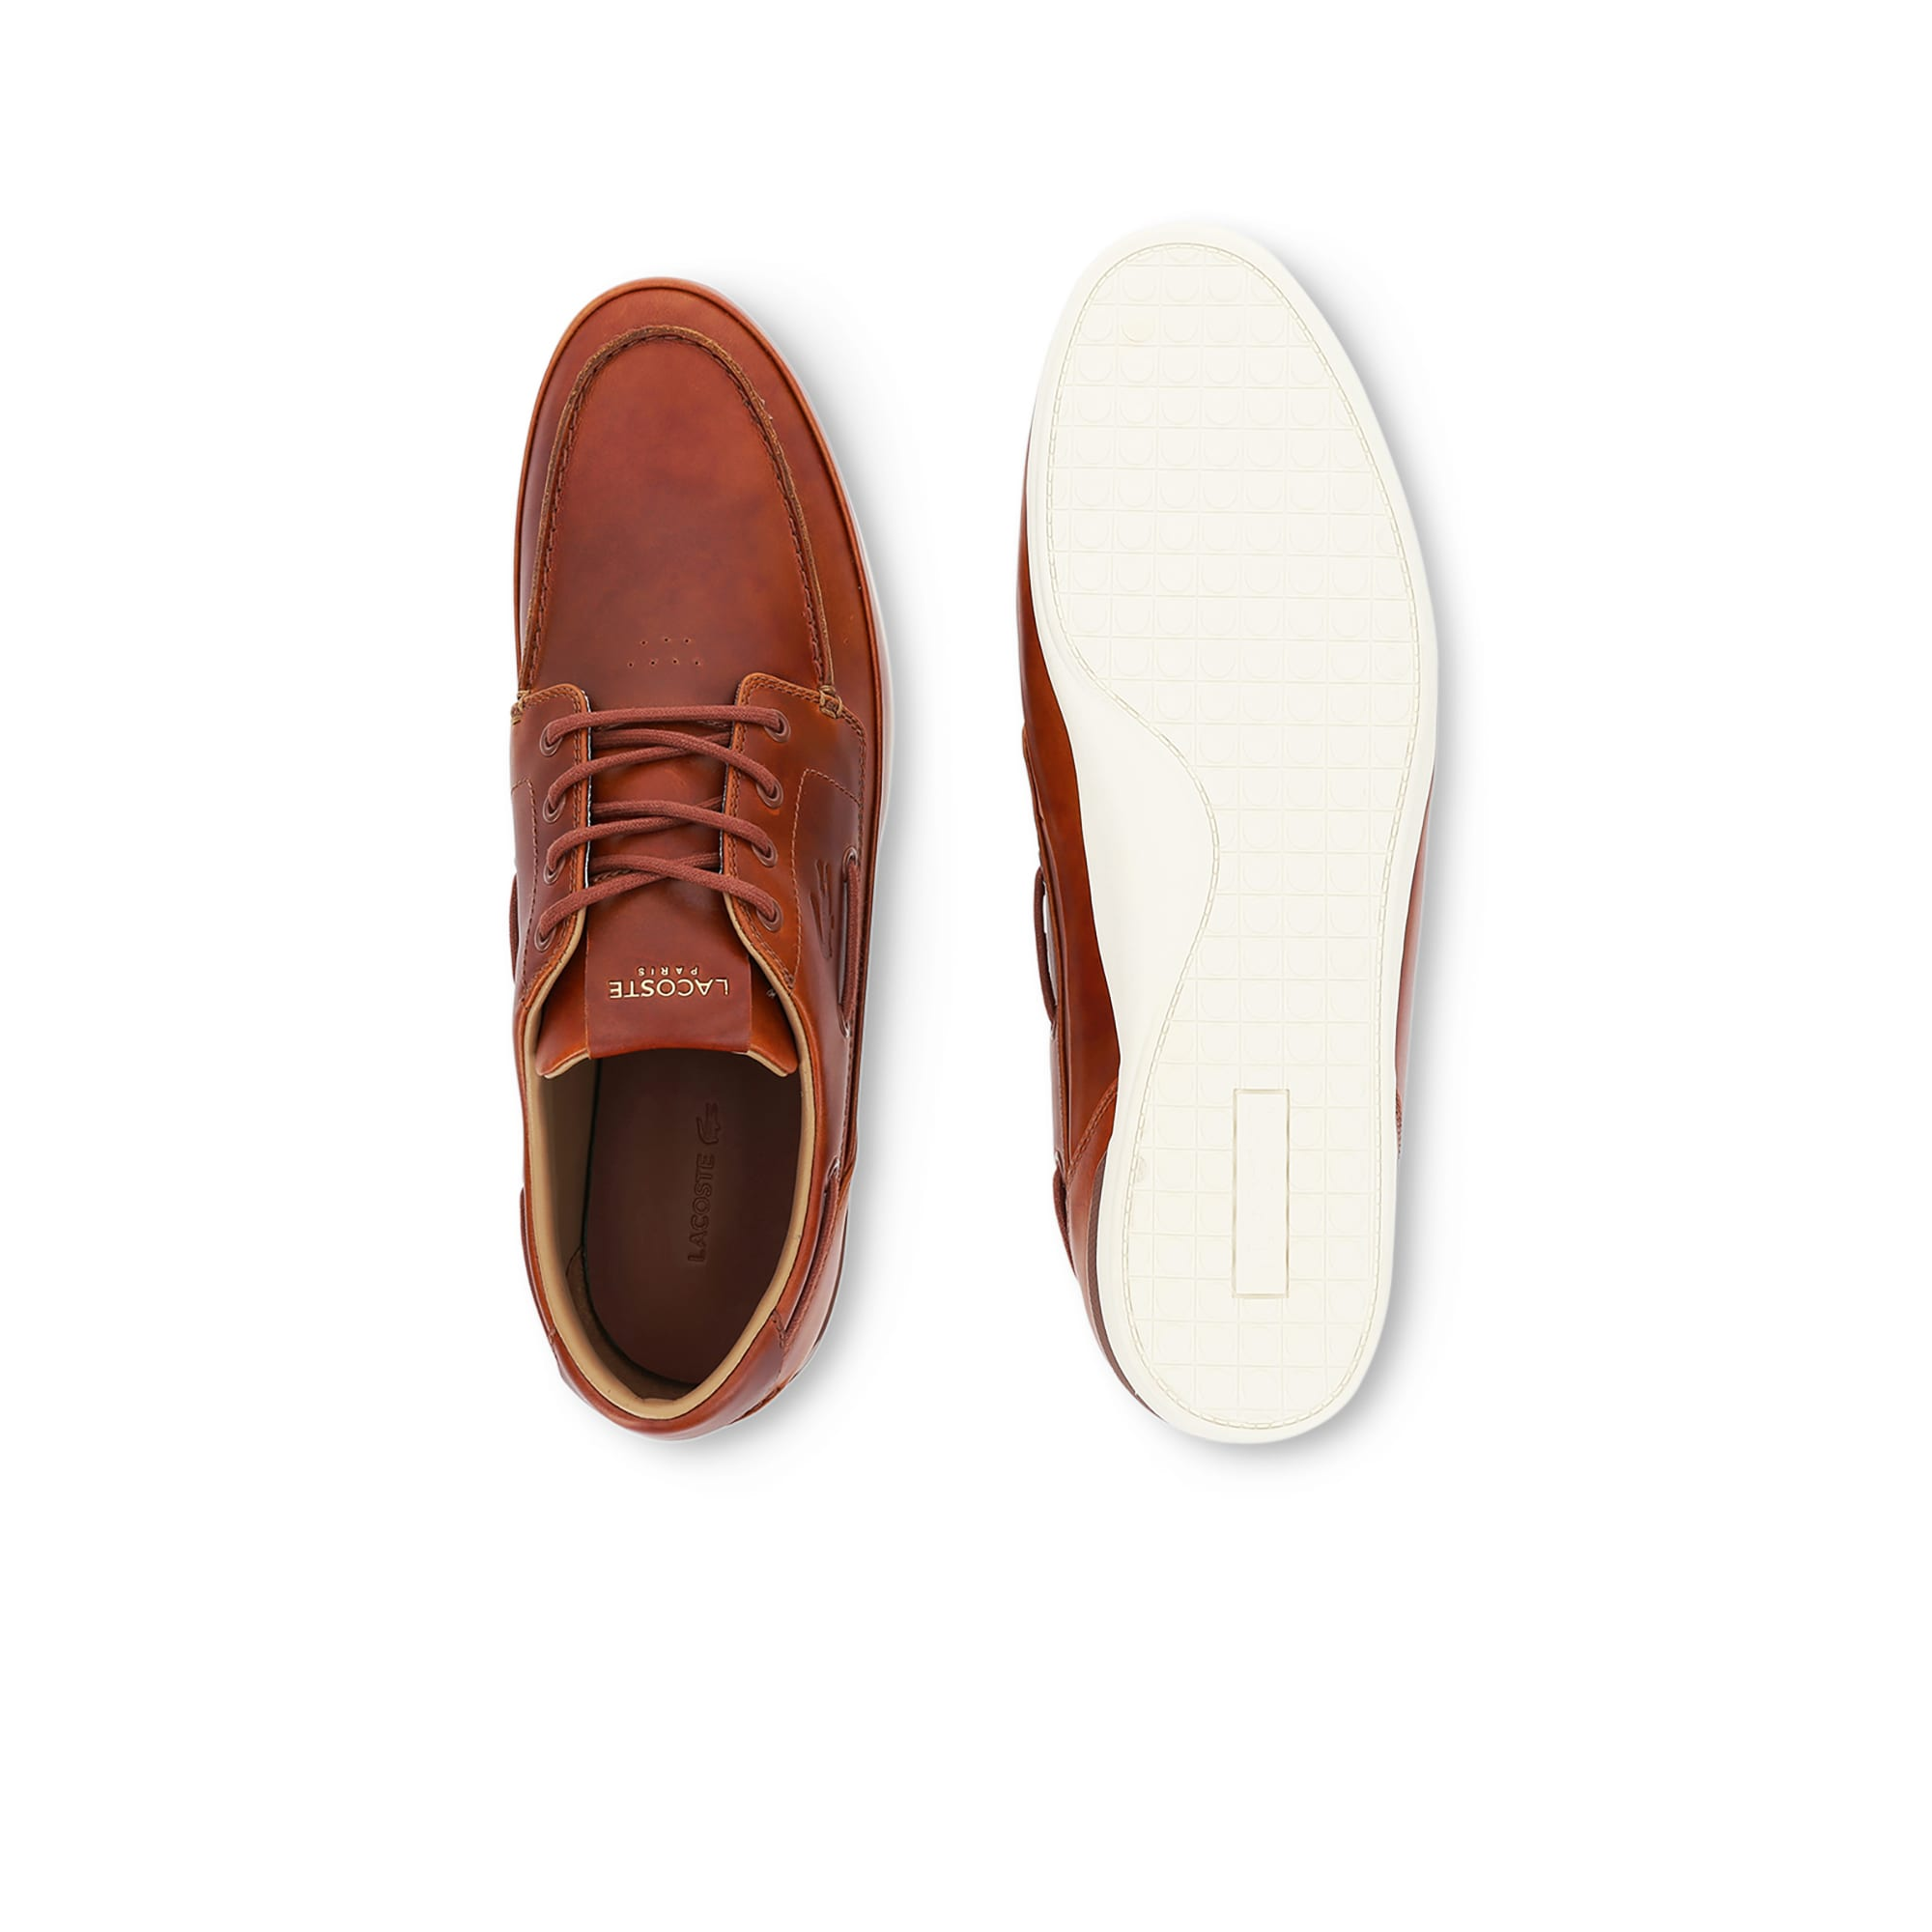 8f8c594723 En Chaussures Marina Bateau Premium Cuir Lacoste Homme qtU6Twp